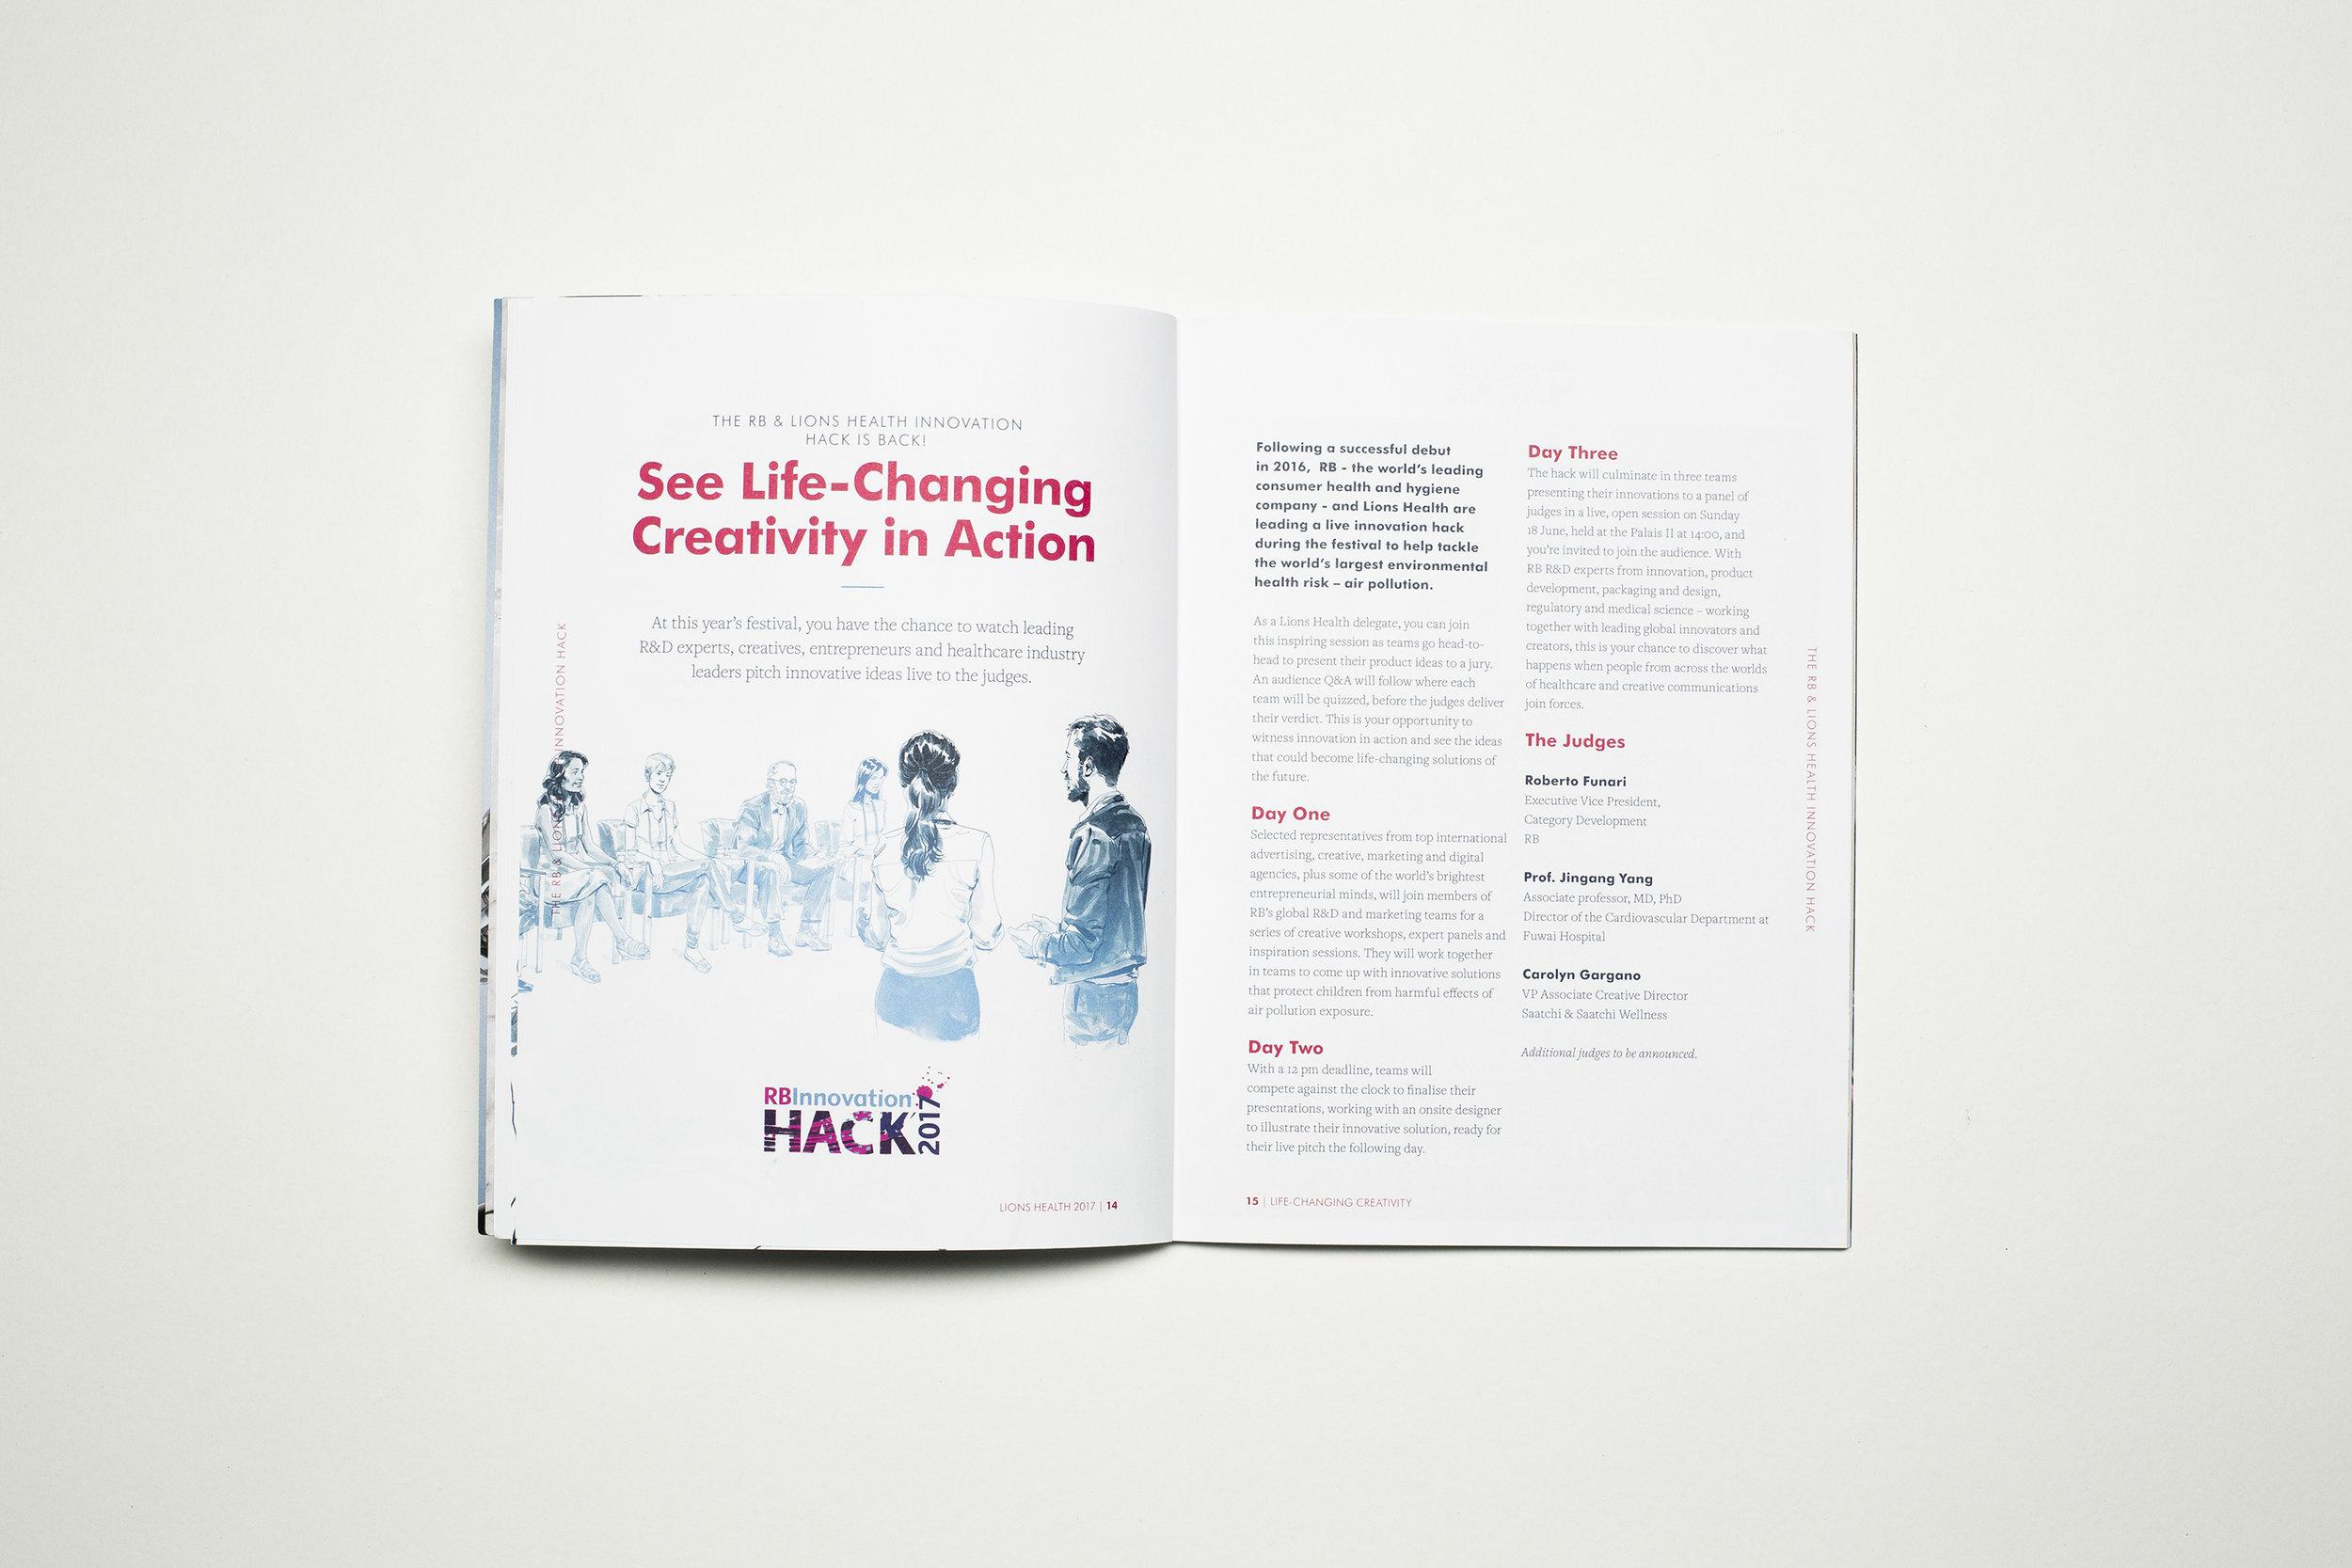 Scriberia Cannes Lions Festival of Creativity Illustration Rupert